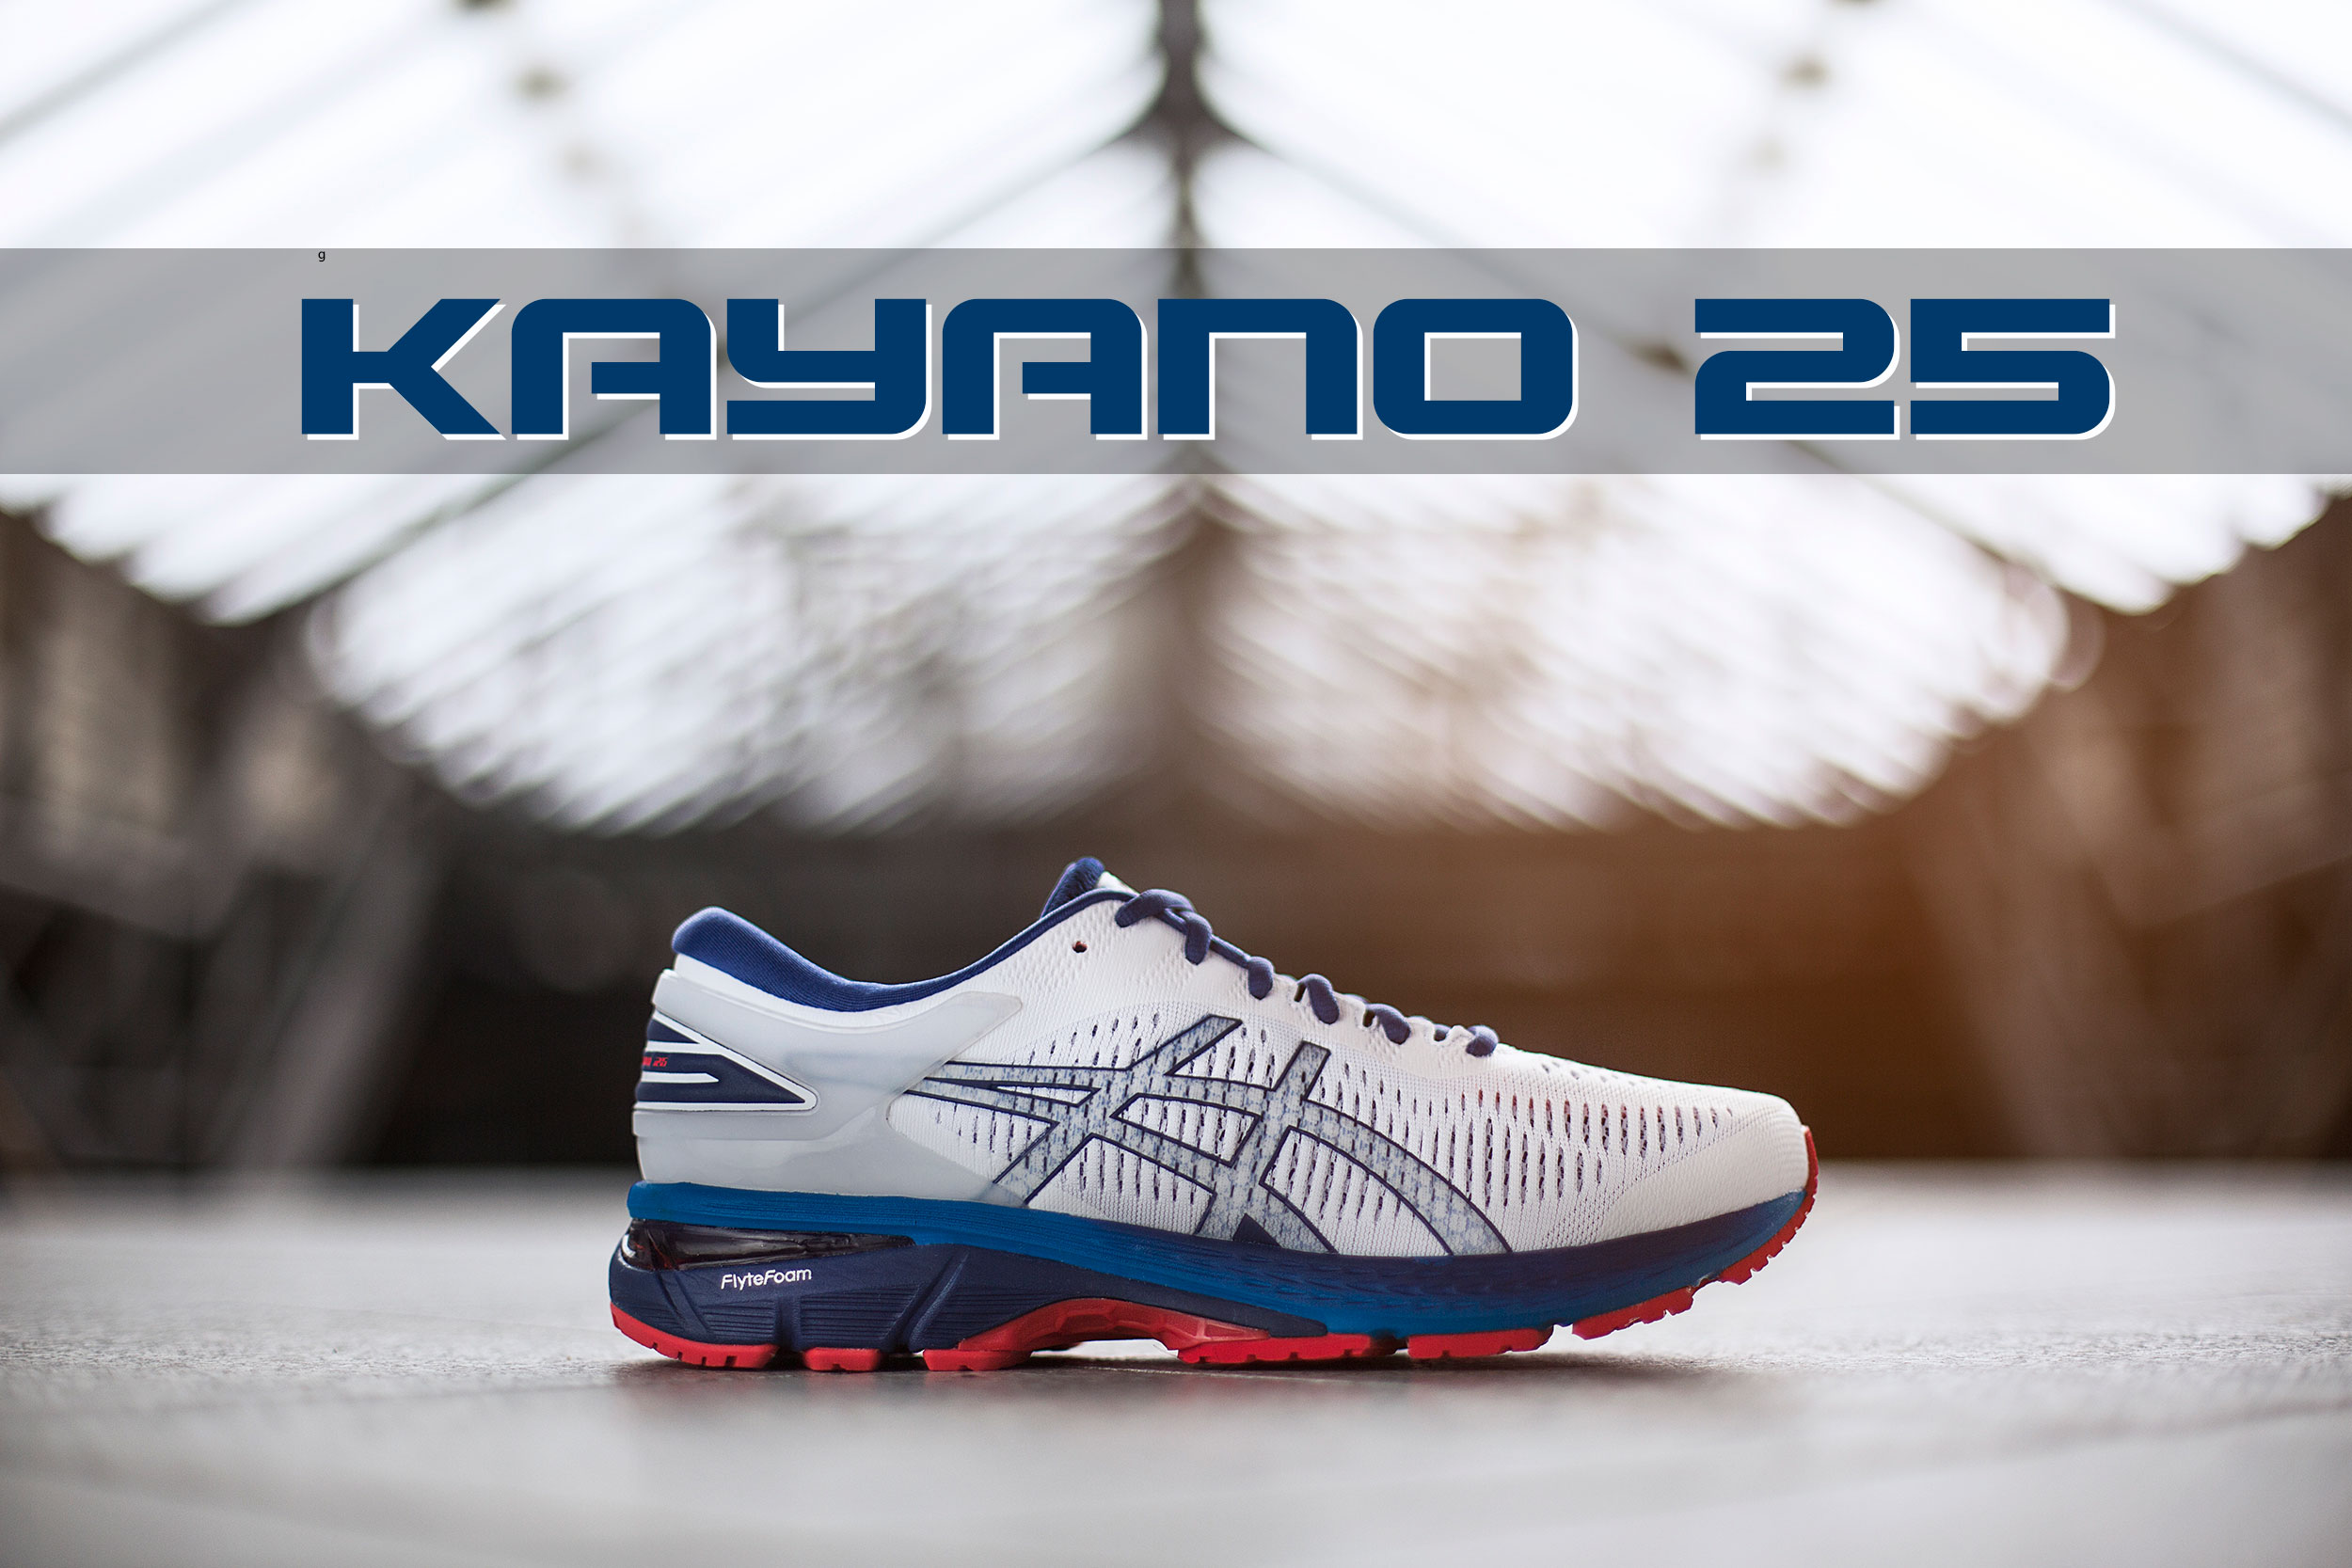 3e69766f086ee Asics Gel Kayano 25 - Primeras Impresiones - Análisis - StreetProRunning